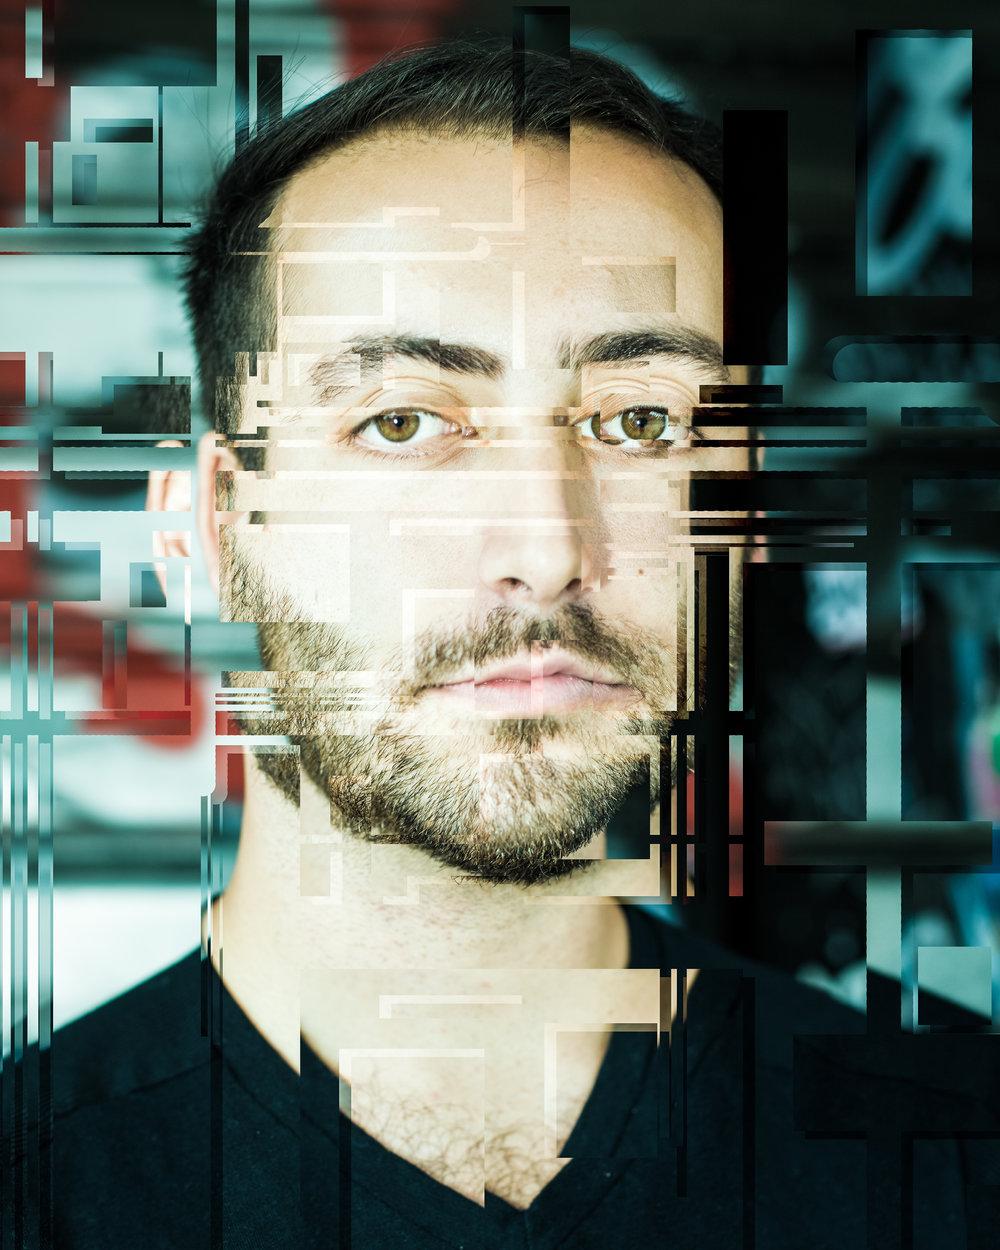 jake glitch-1.jpg